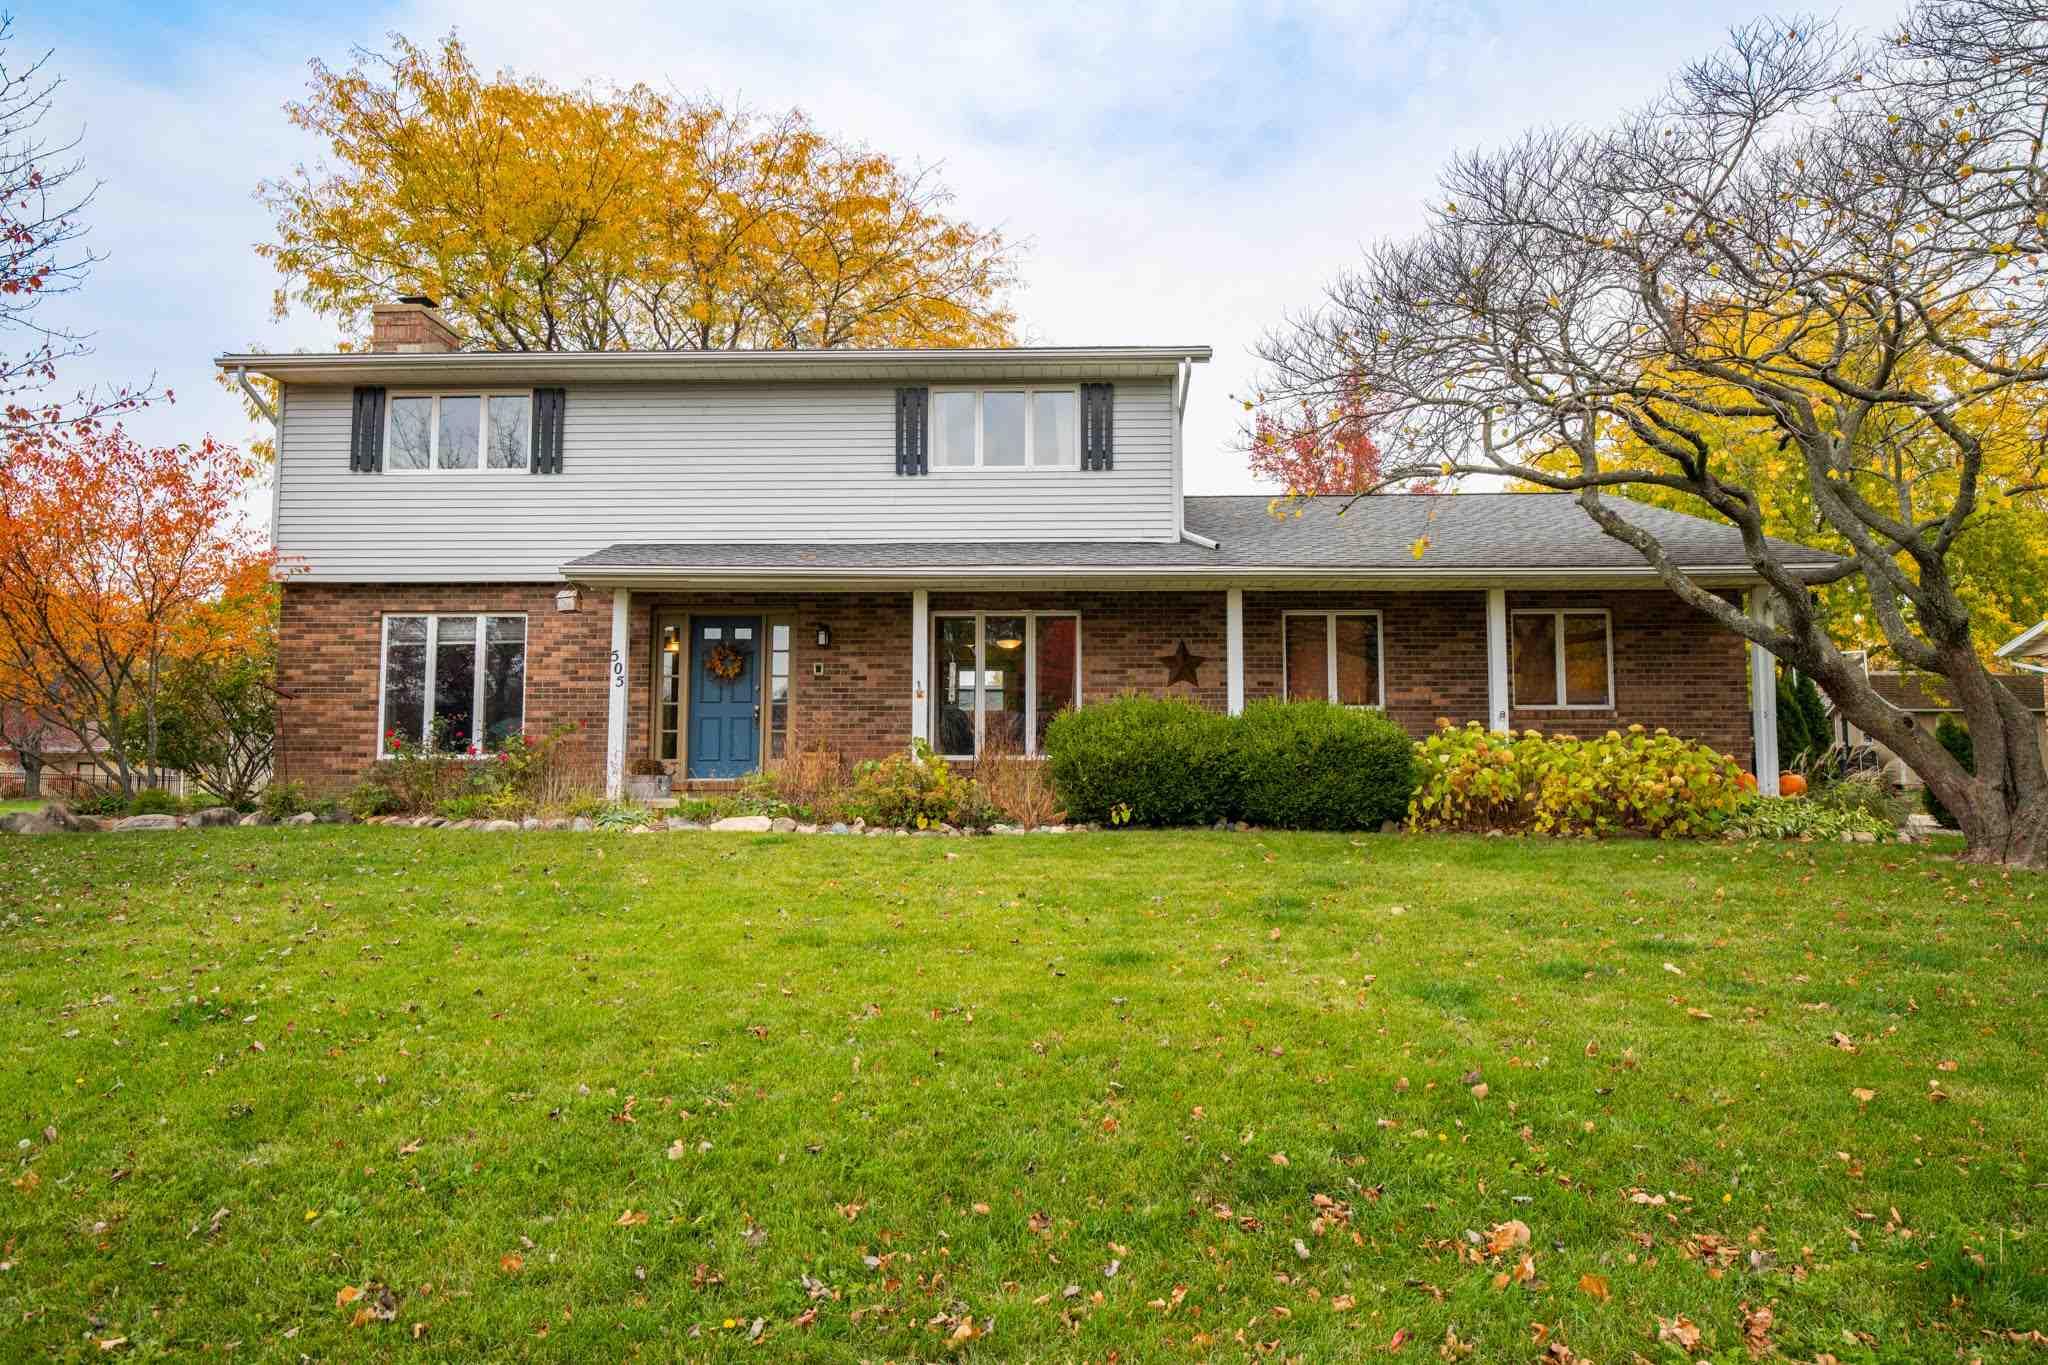 505 RIDGE Property Photo - Eureka, IL real estate listing